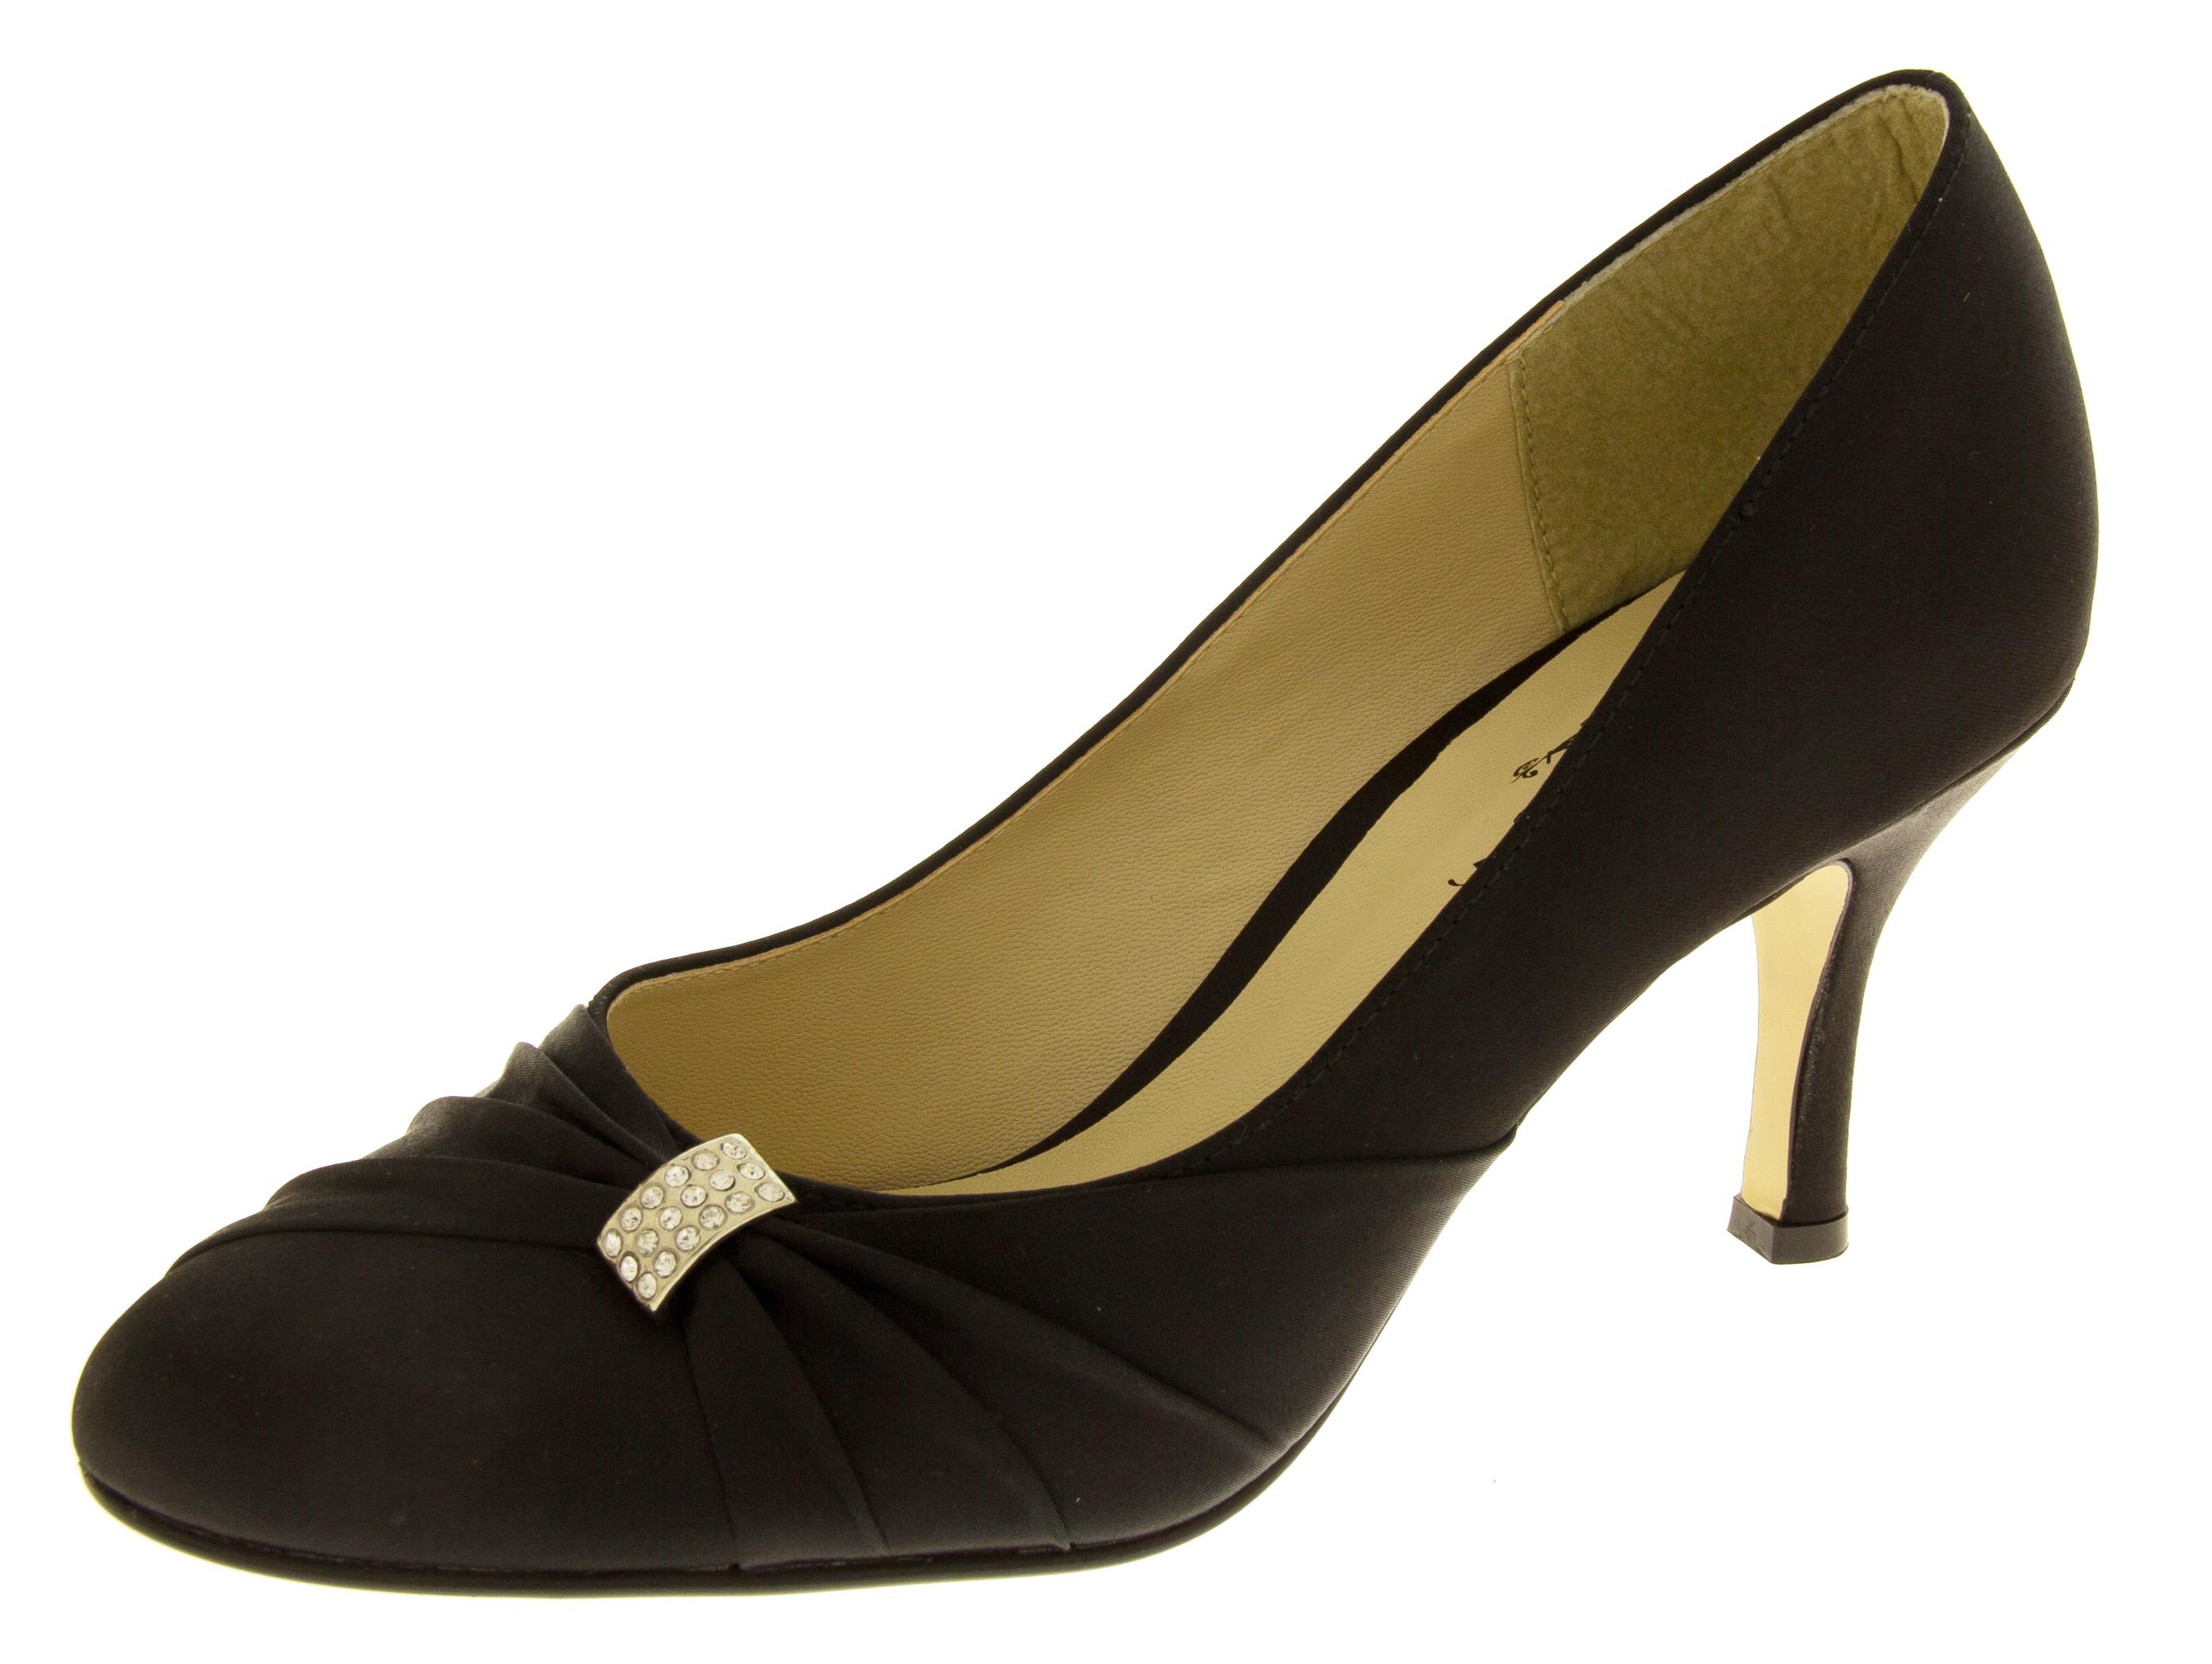 Womens Low Heel Satin Diamante Court Shoes